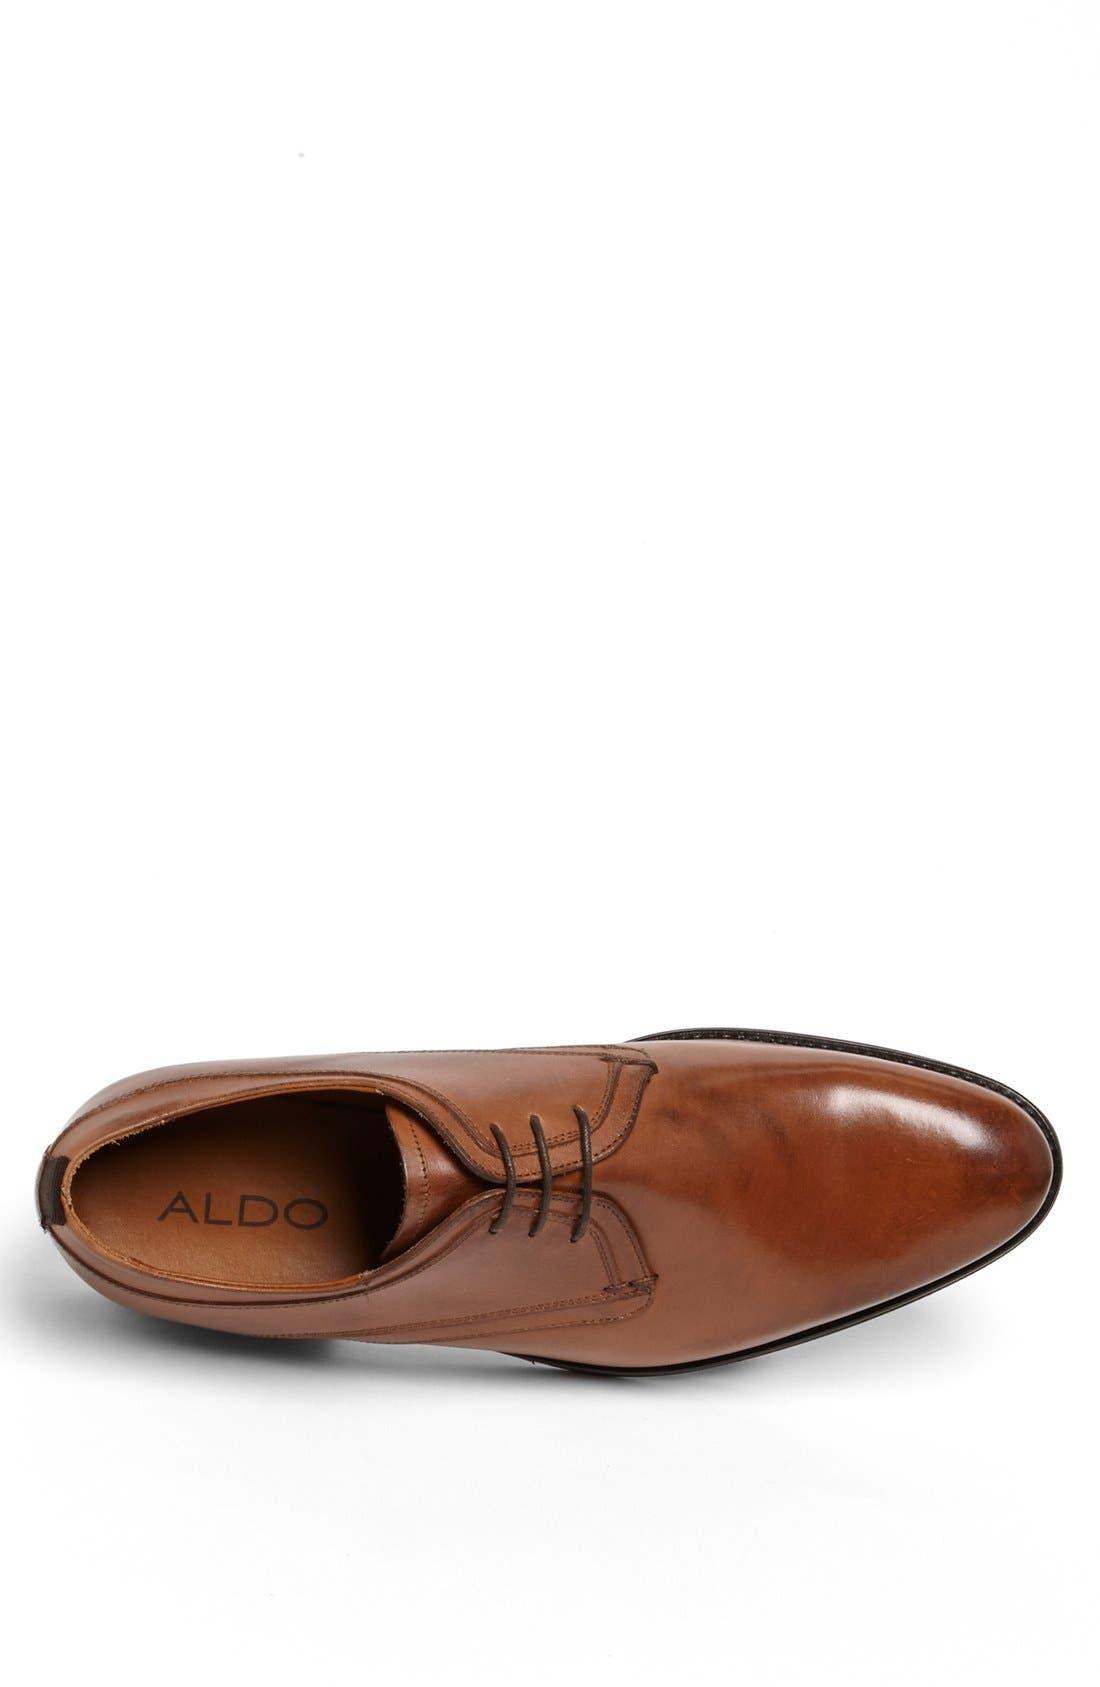 Alternate Image 3  - ALDO 'Tumma' Plain Toe Derby (Men)